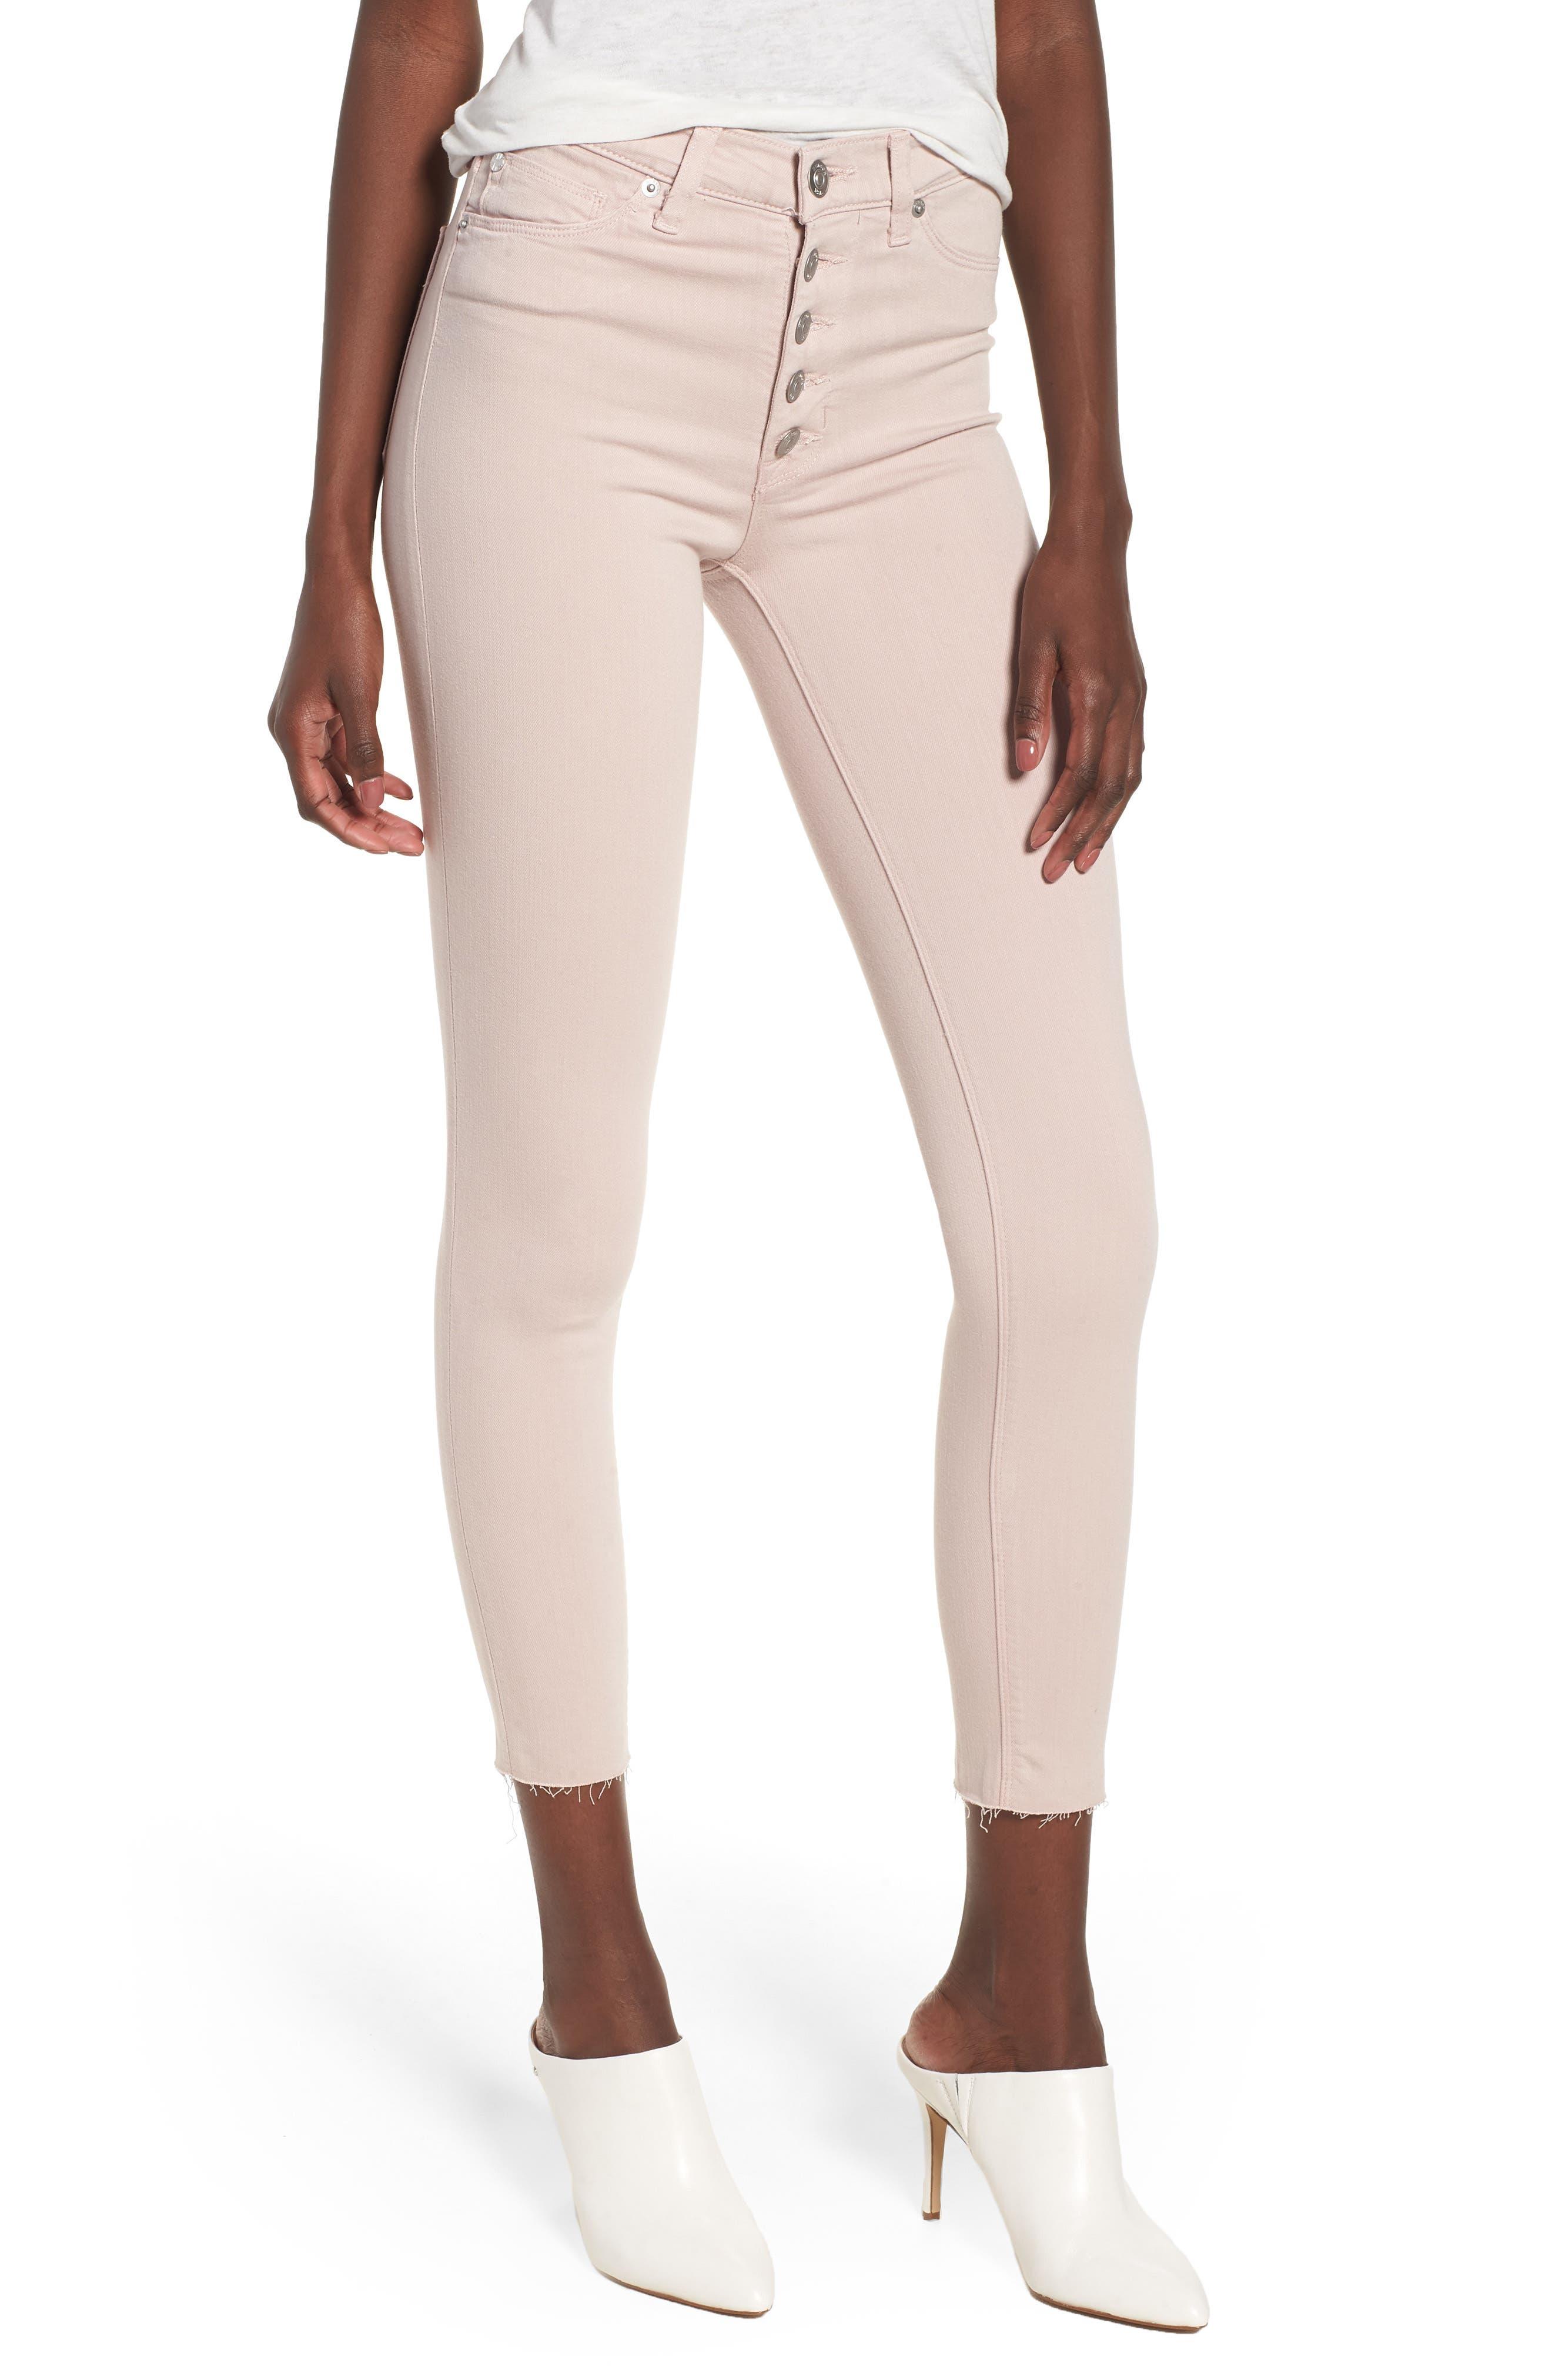 Barbara High Waist Raw Hem Ankle Skinny Jeans,                             Main thumbnail 1, color,                             681